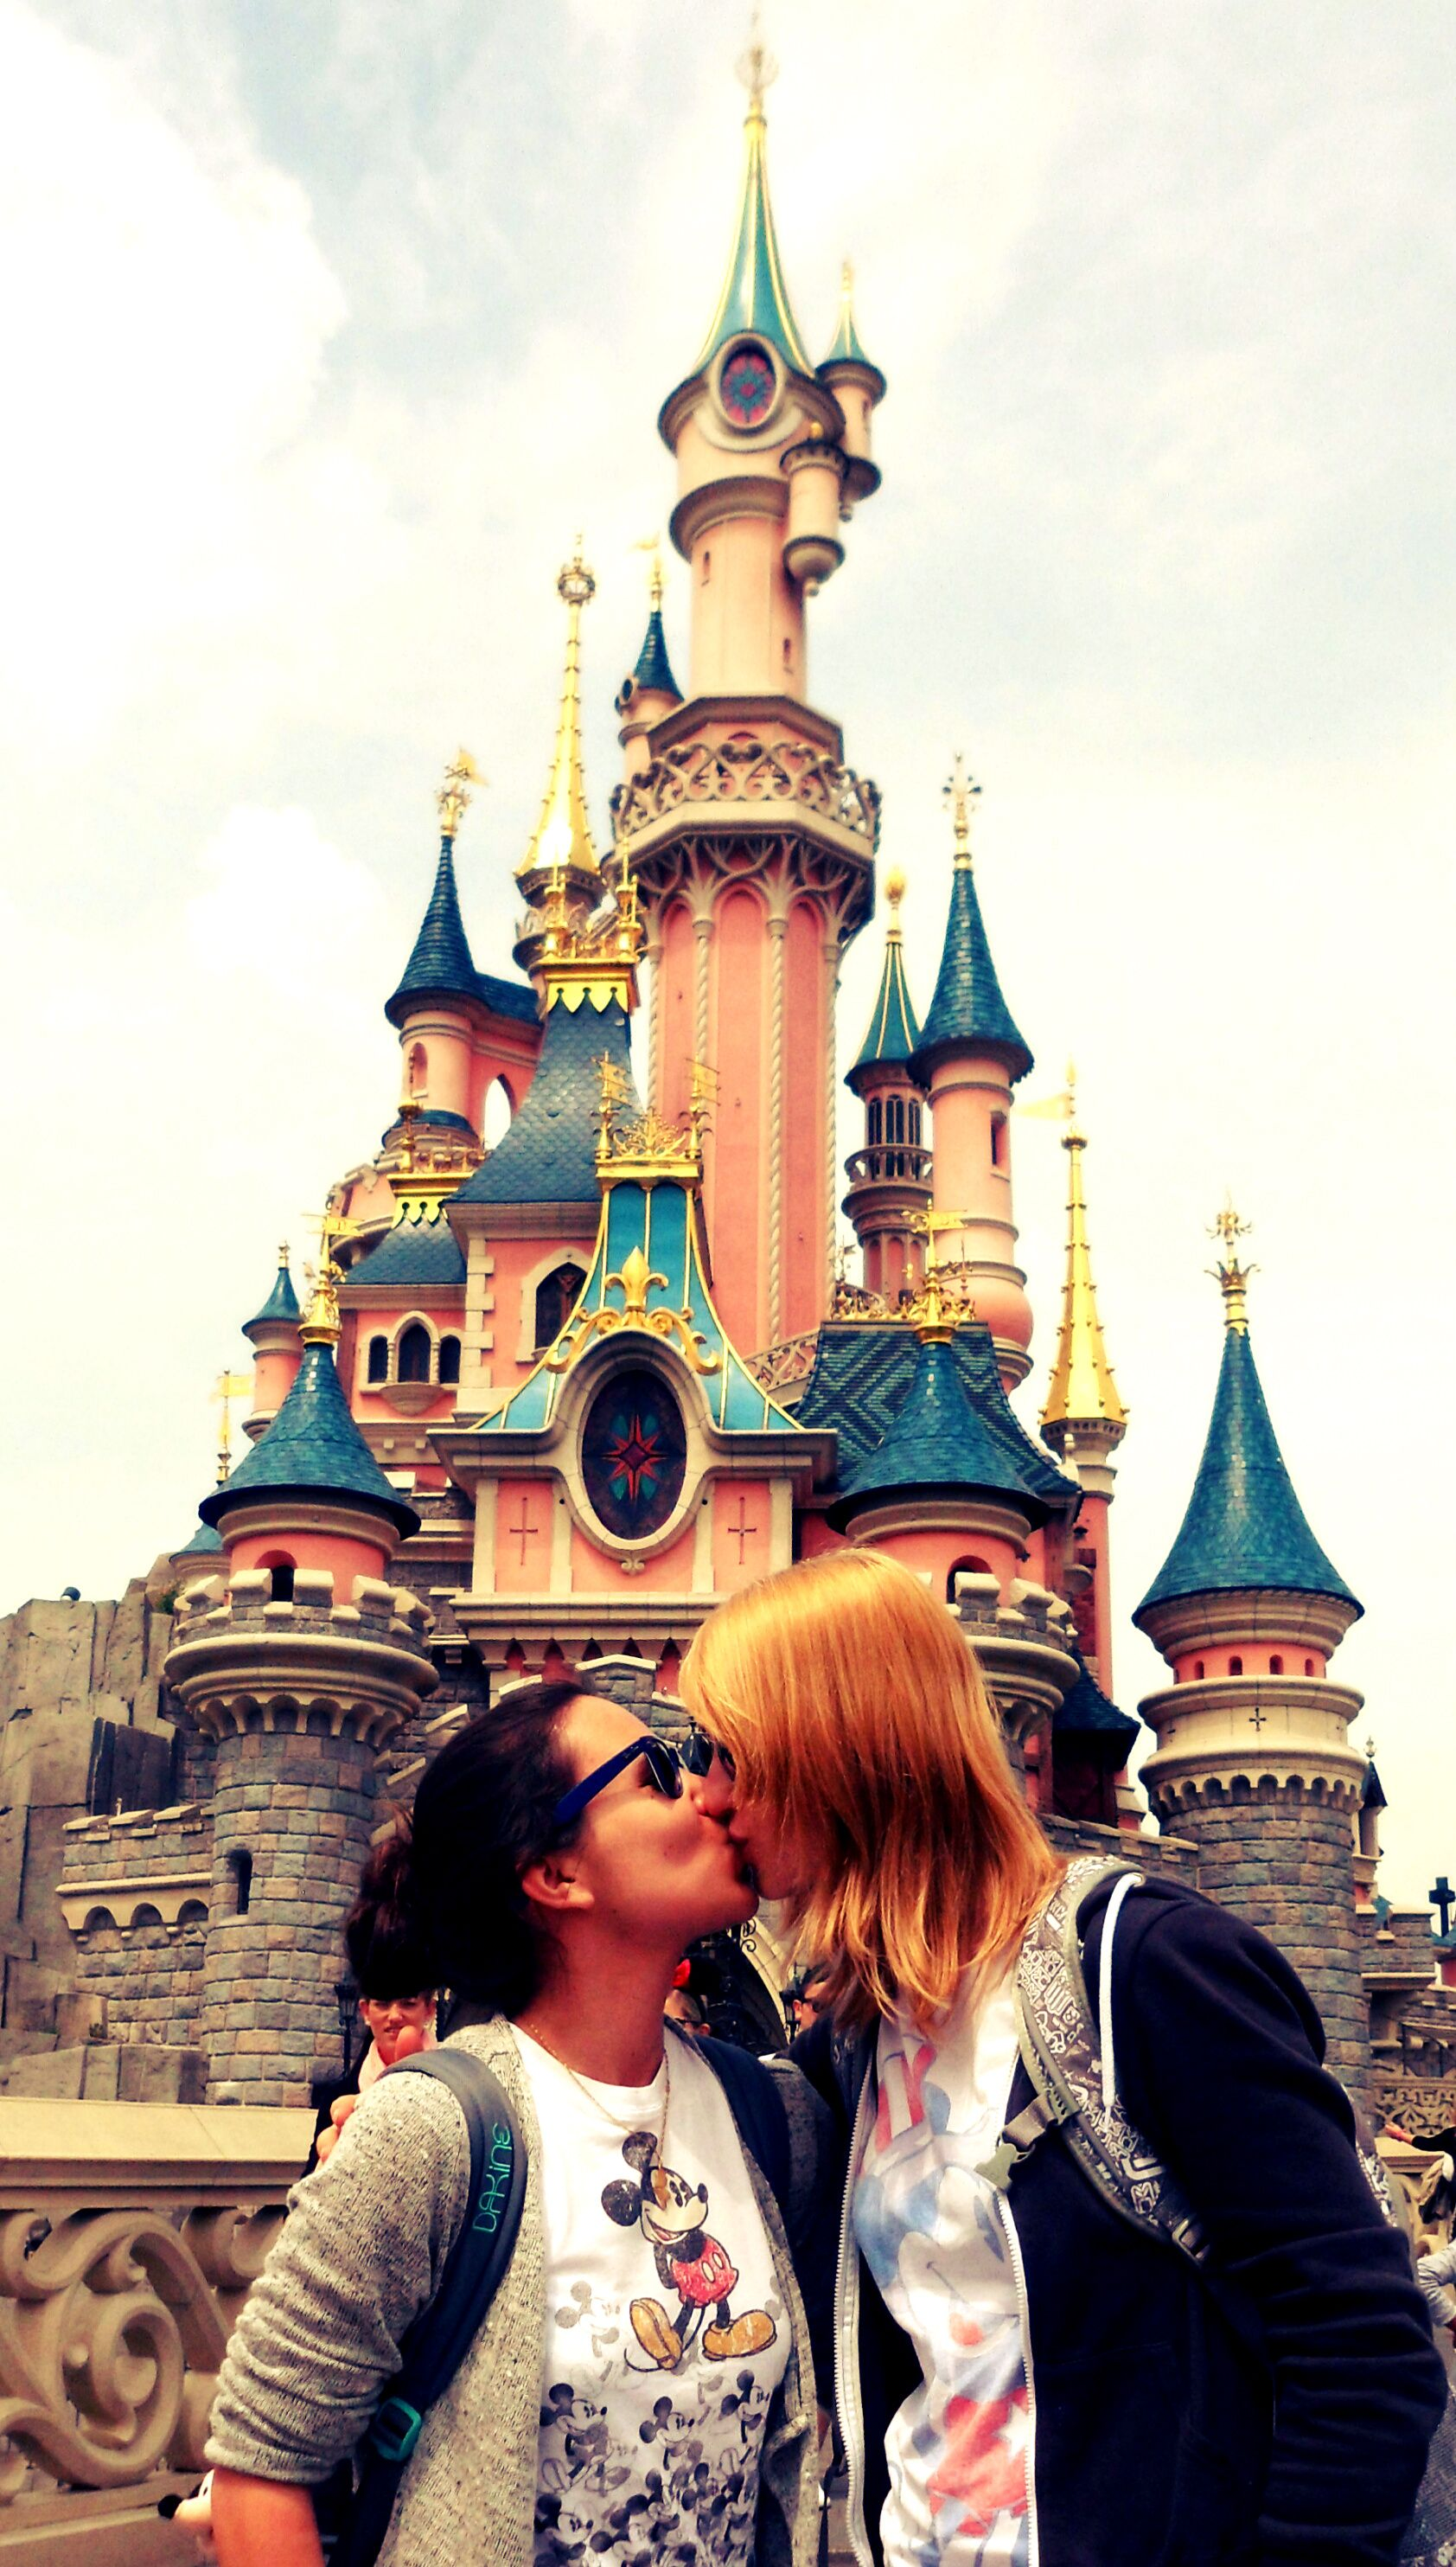 Disneyland photos disneyland paris bride groom table grooms table -  Disneyland Paris Castle Love Equality Gay Lesbian Cutestcouple